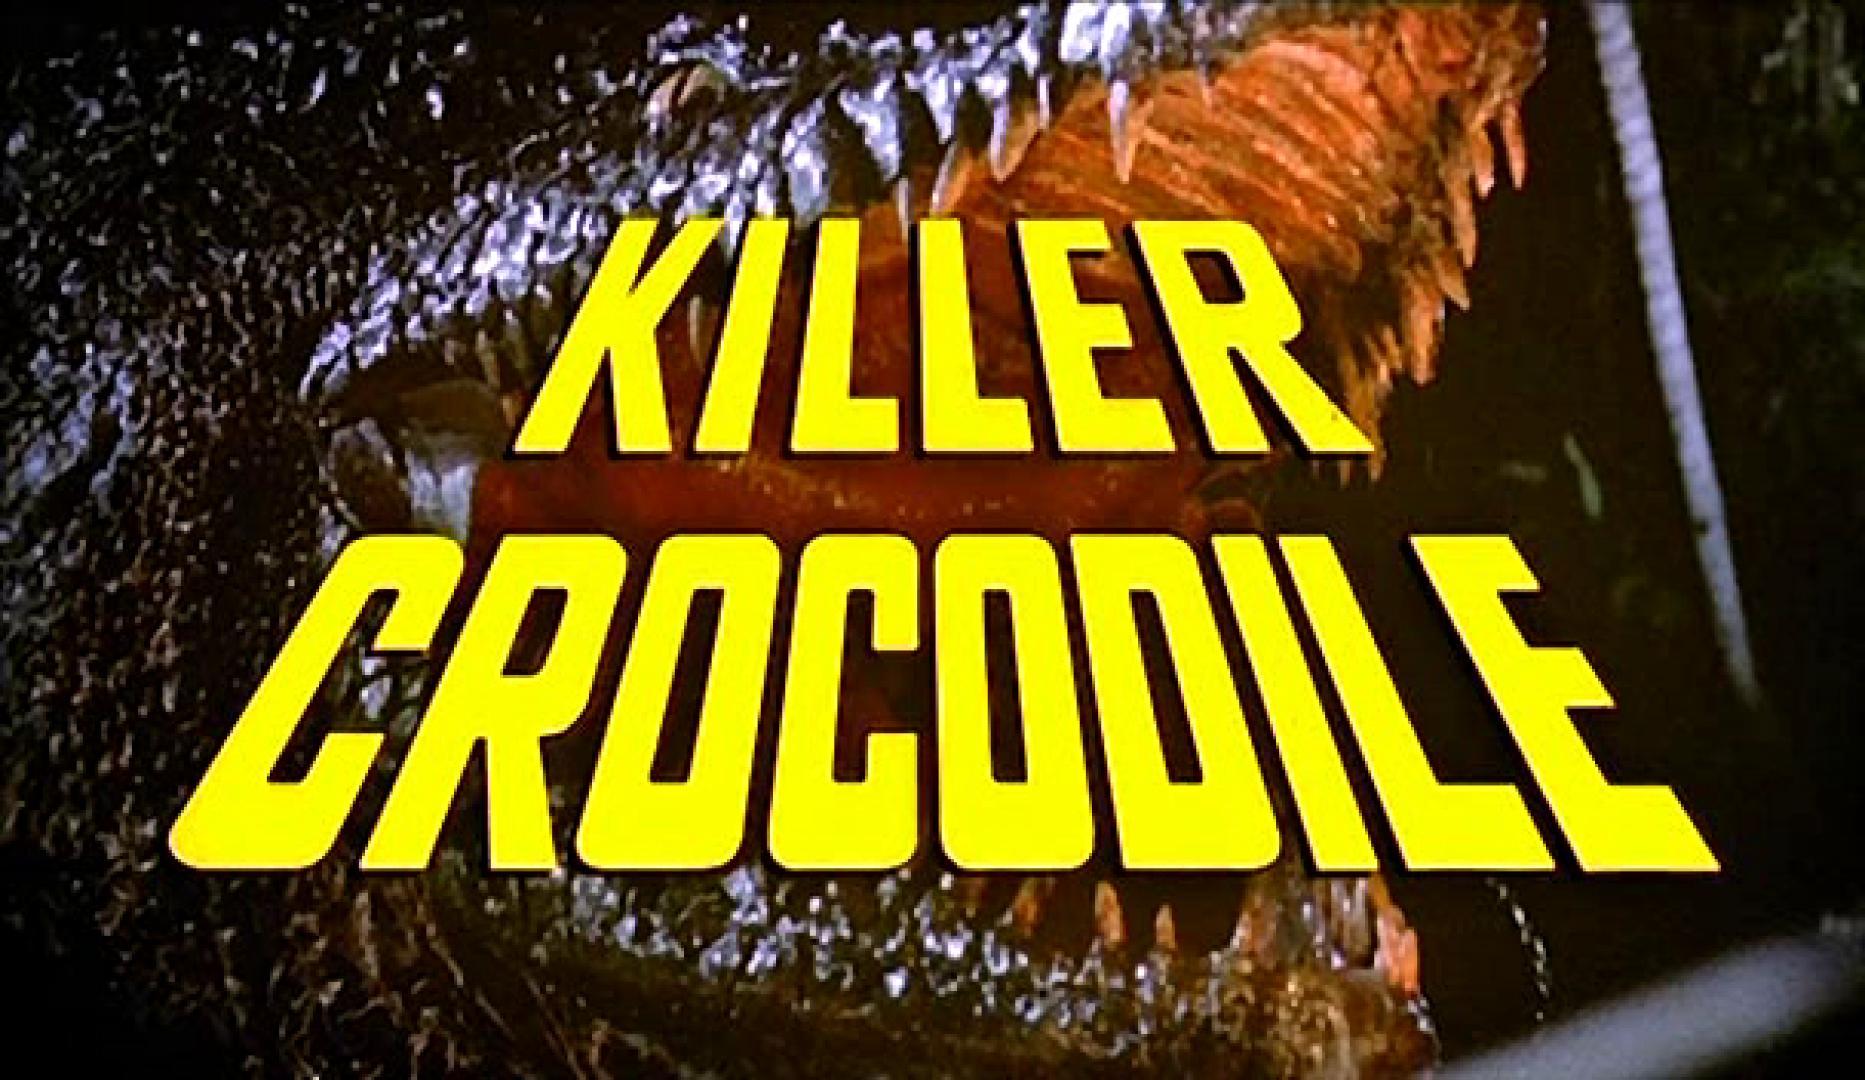 Killer Crocodile - Gyilkos krokodil (1989)